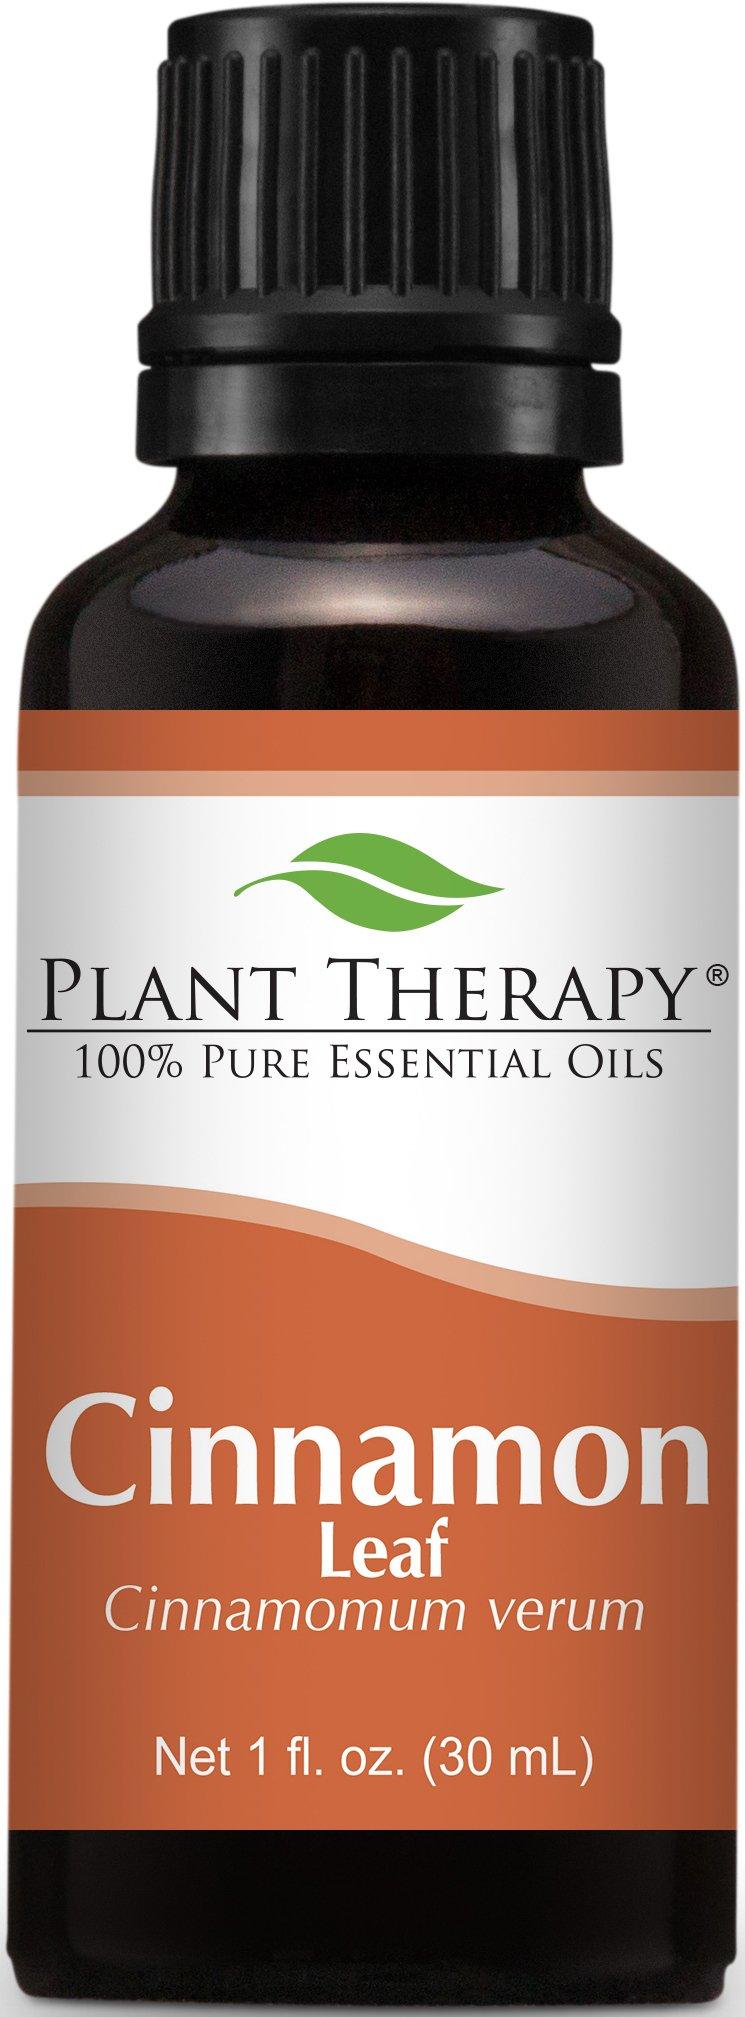 Plant Therapy Cinnamon Leaf Essential Oil. 100% Pure, Undiluted, Therapeutic Grade. 30 ml (1 oz).